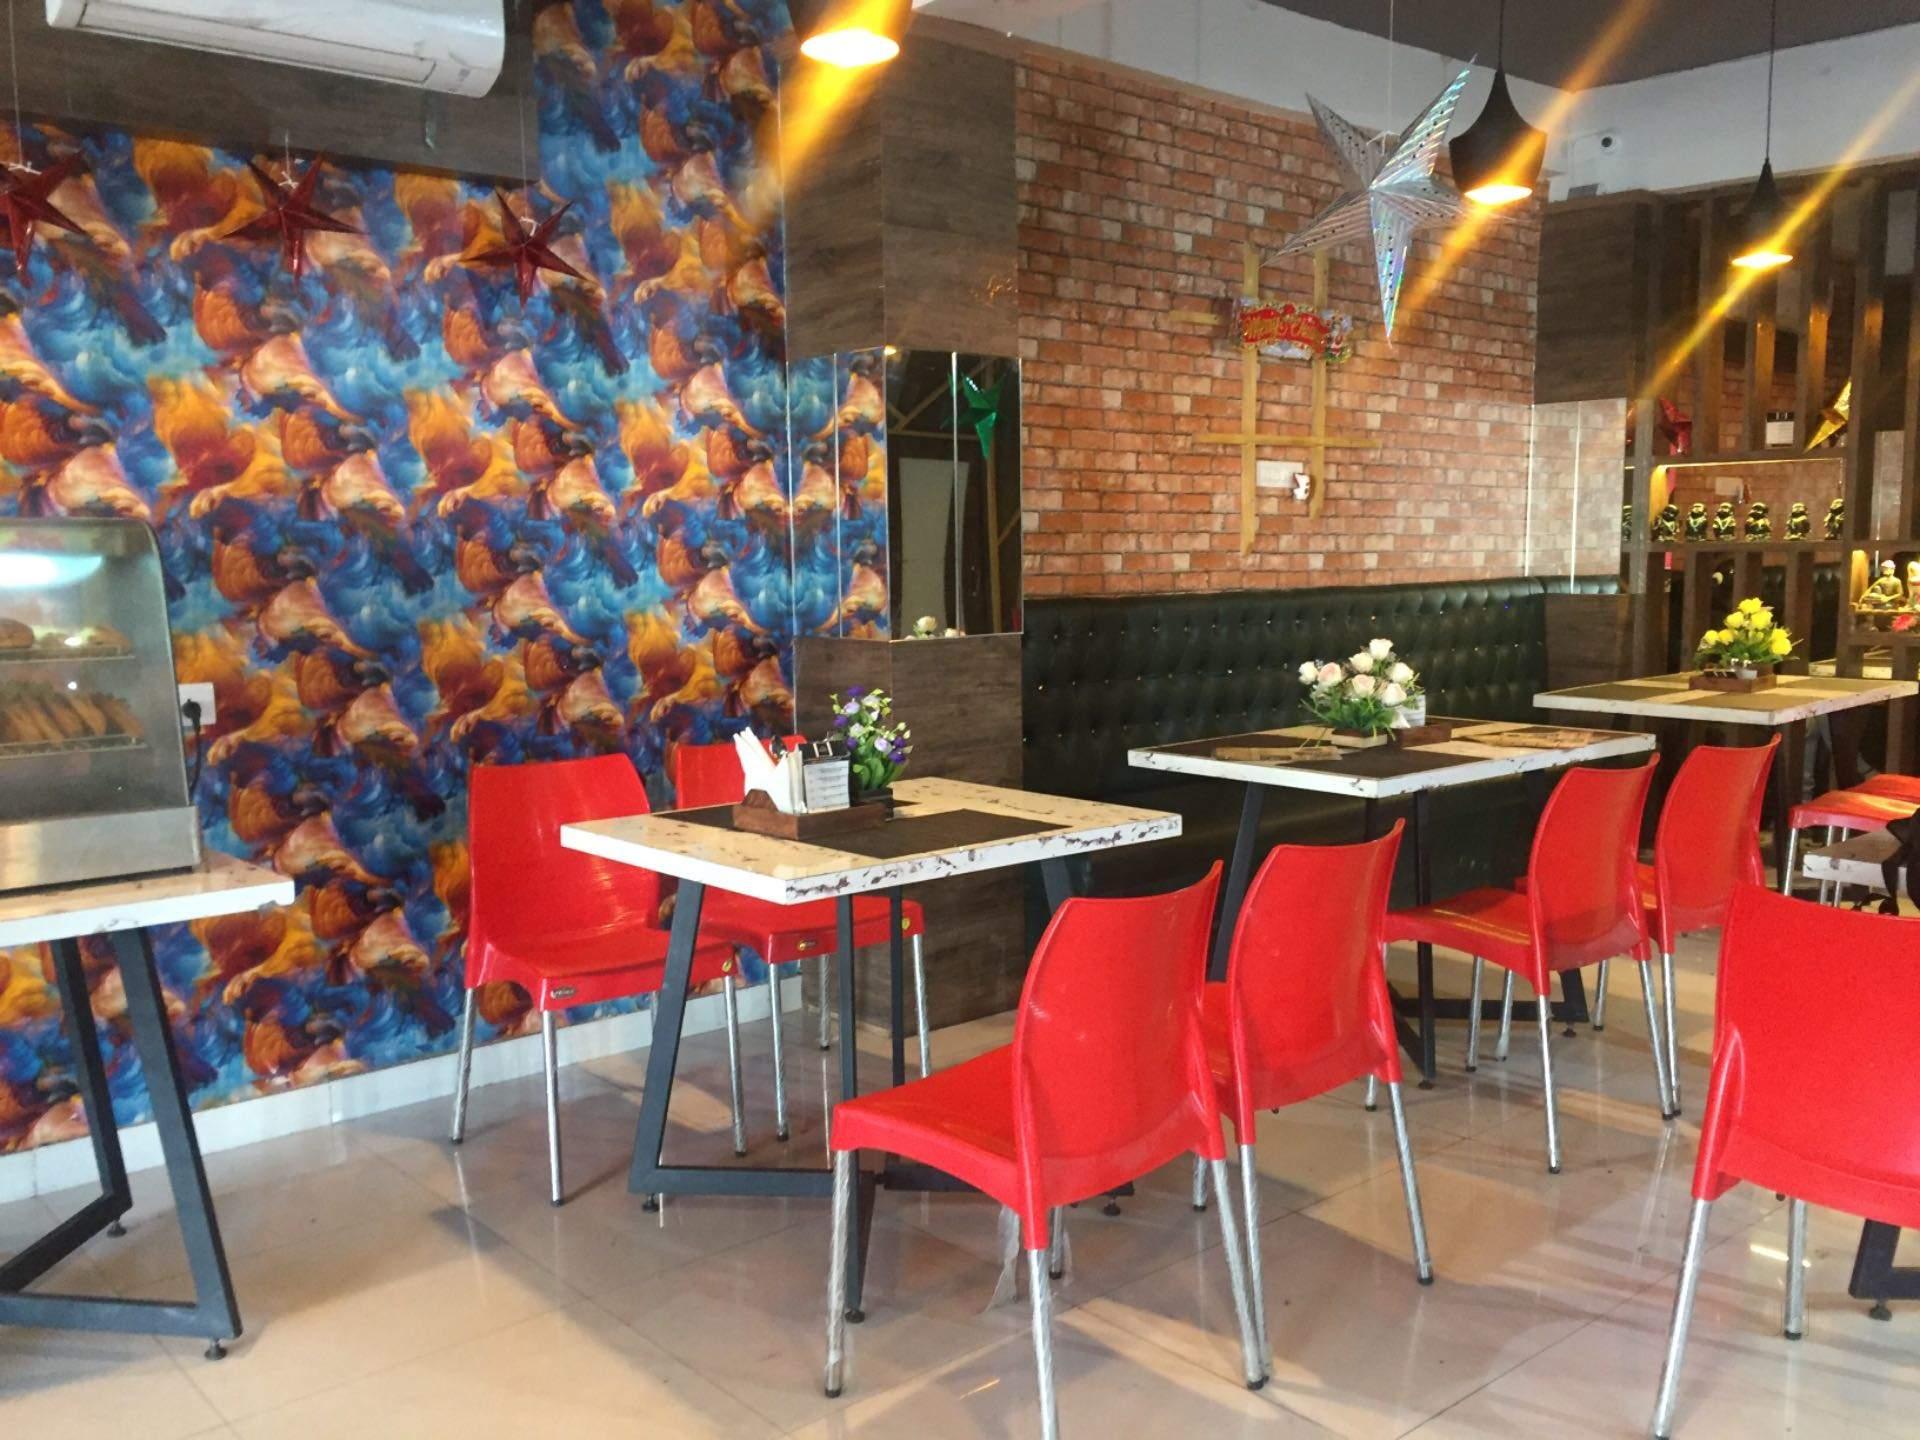 Top Restaurants in Lucknow - Best Restaurants near me - Justdial